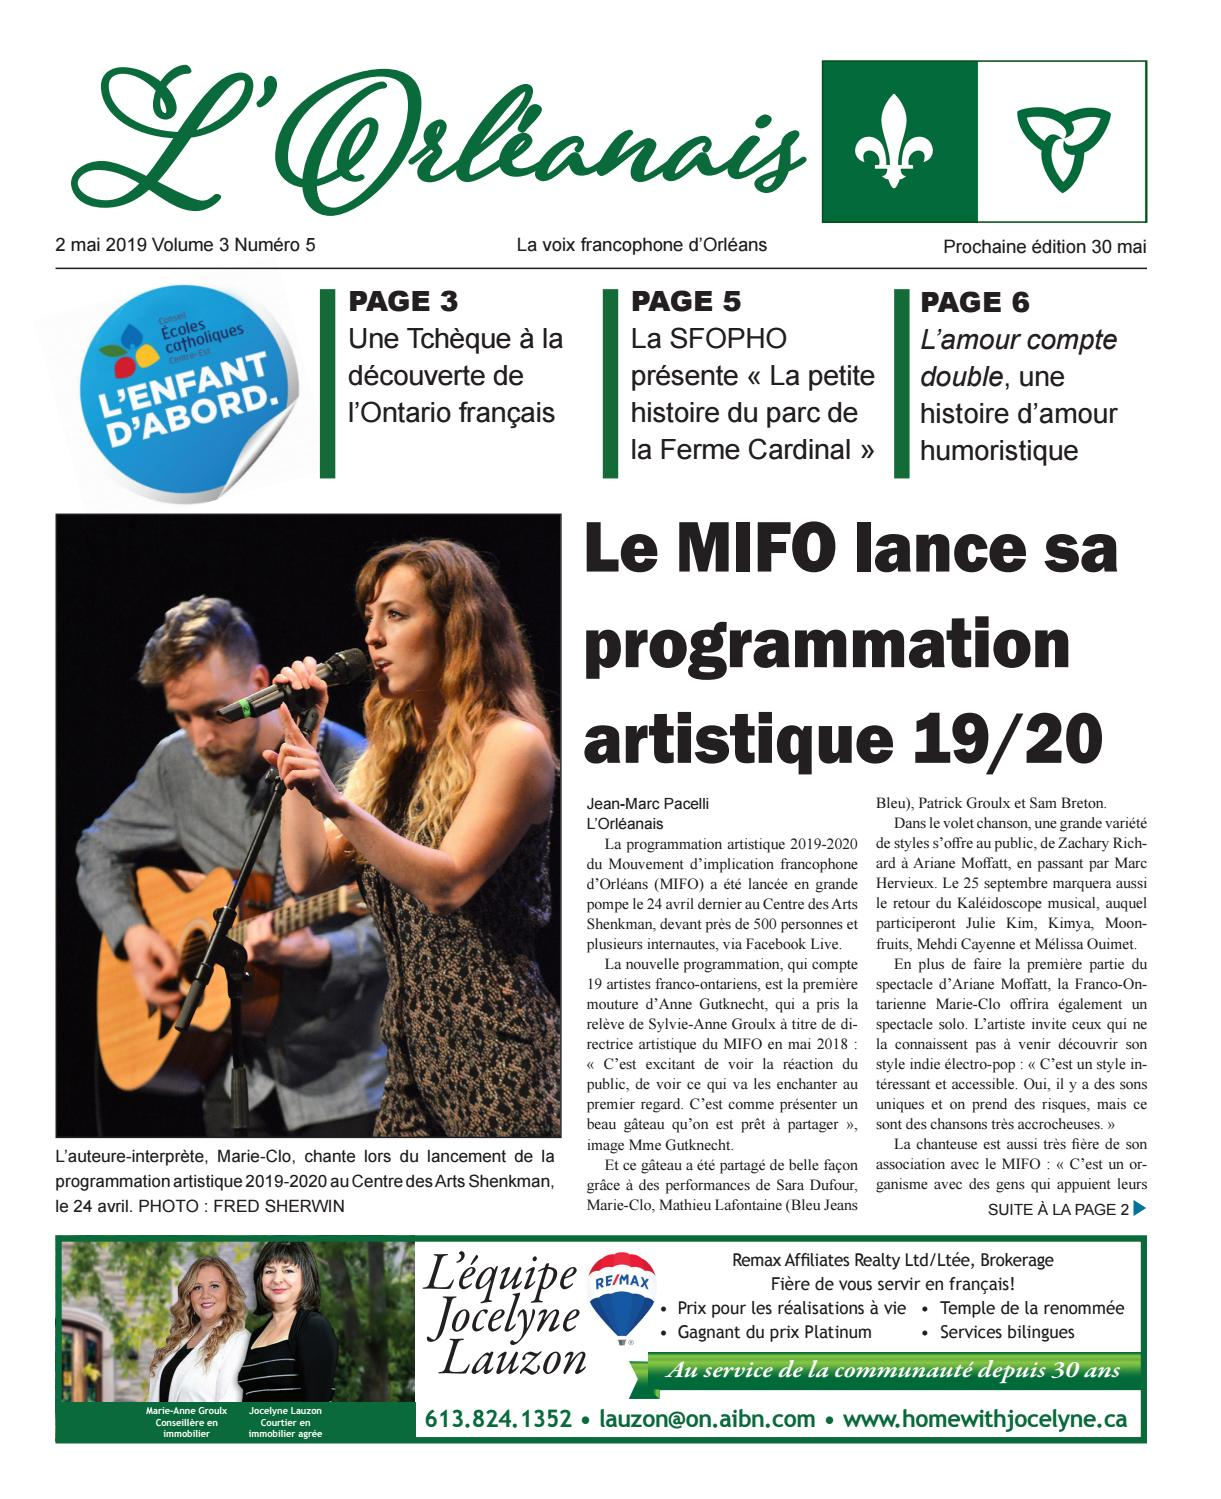 Courtier En Travaux Orléans l'orléanais 2 mai, 2019orléanais - issuu